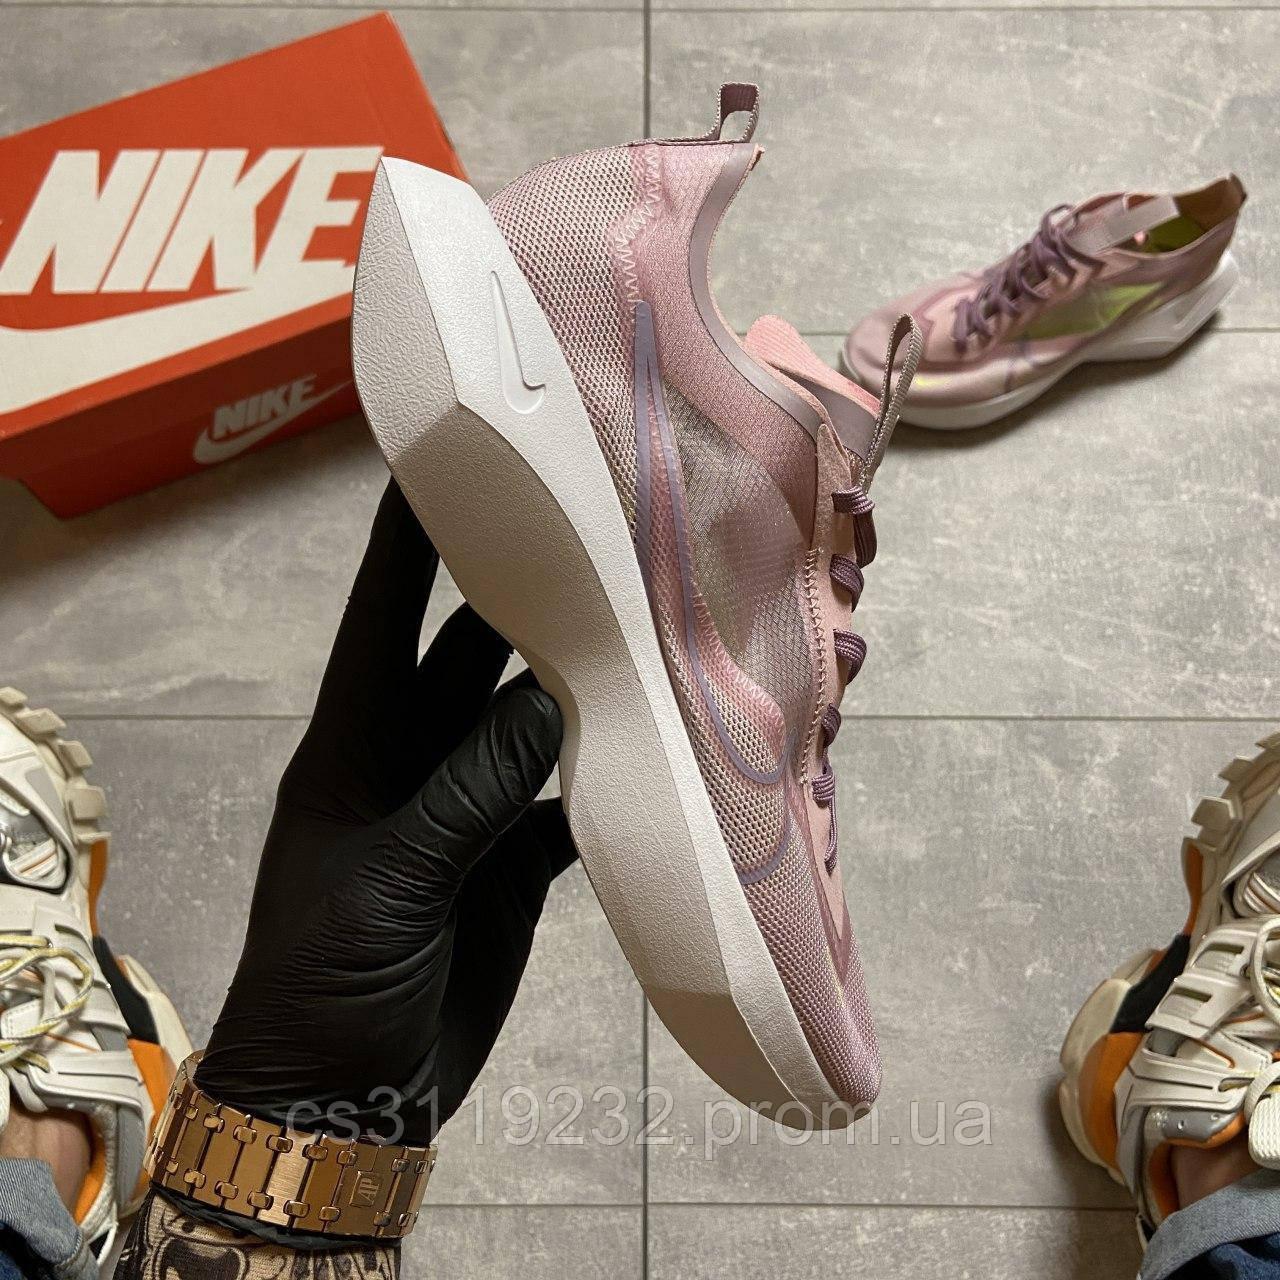 Женские кроссовки Nike Vista White Pink (розовые)